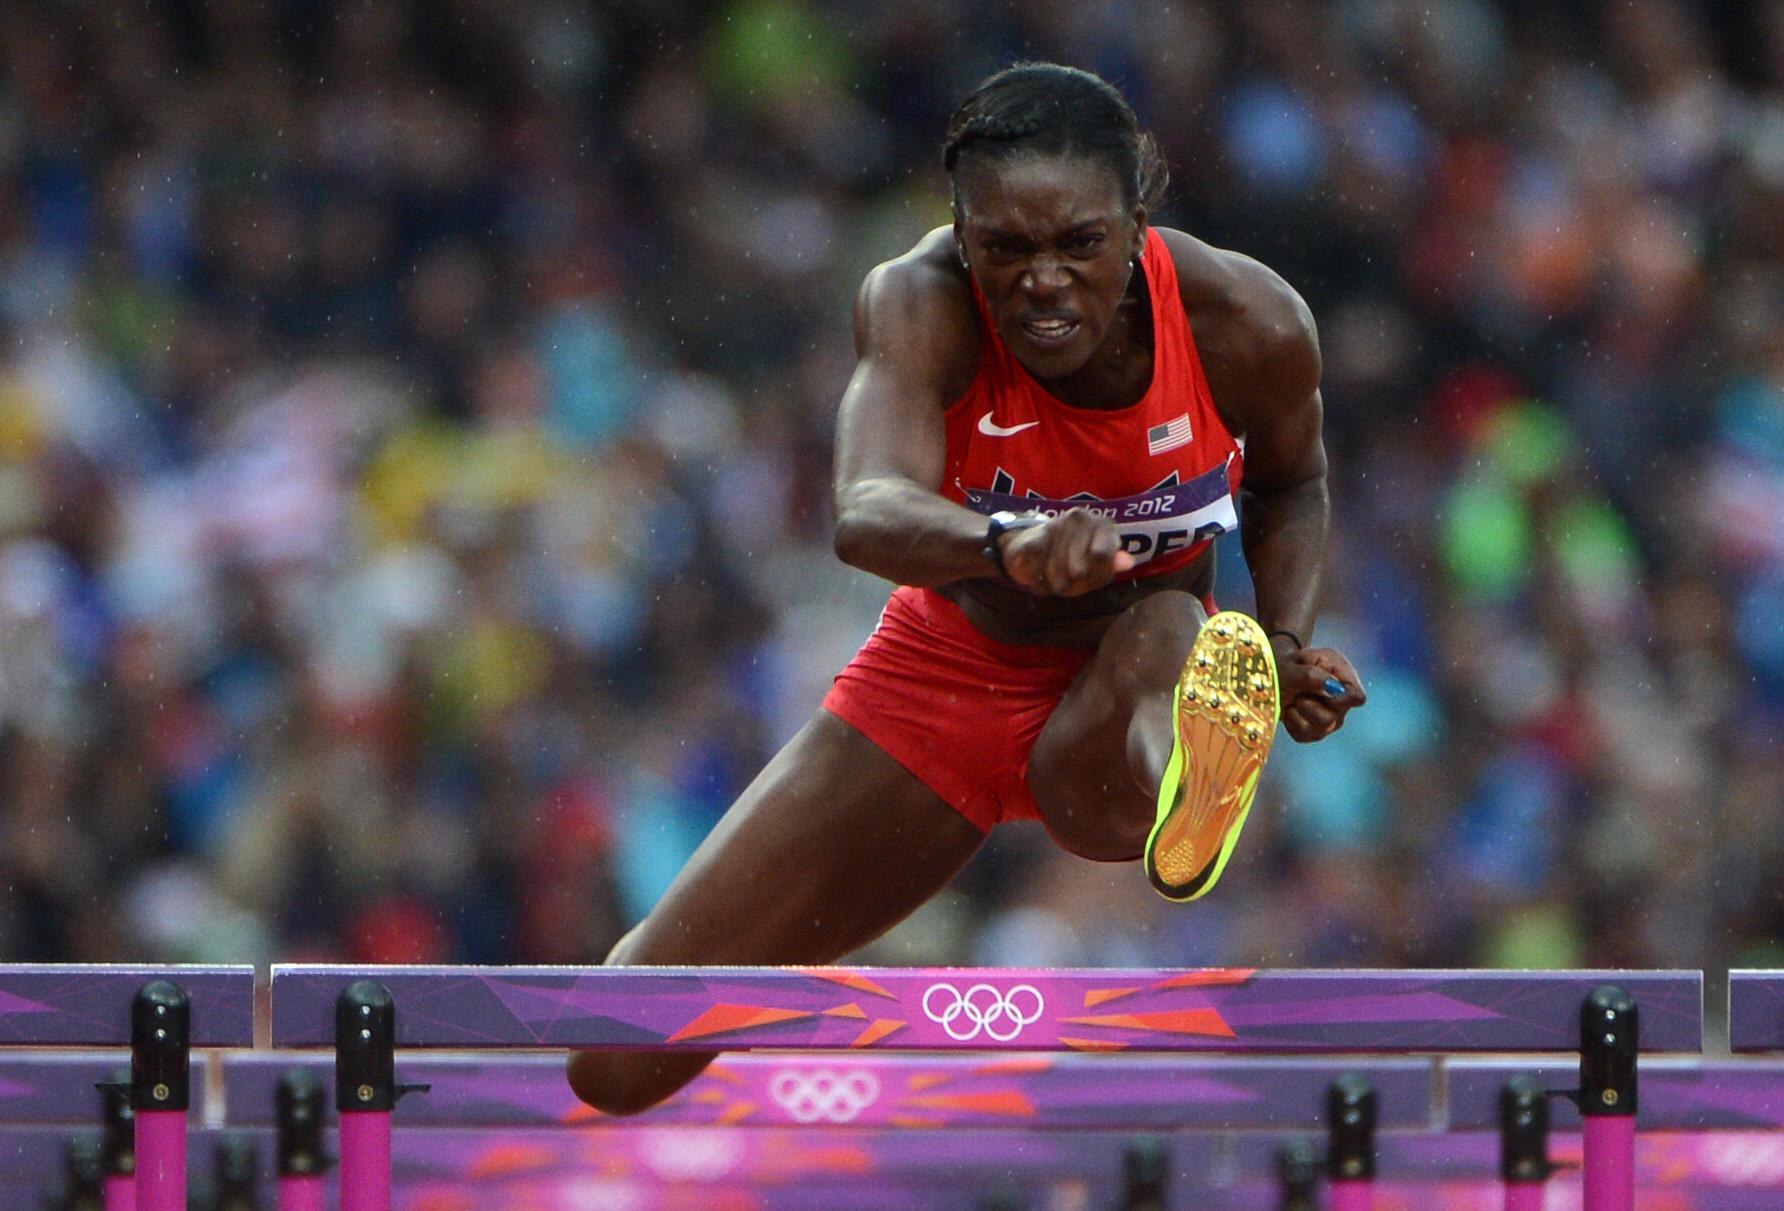 olympic hurdler moses - HD1784×1211